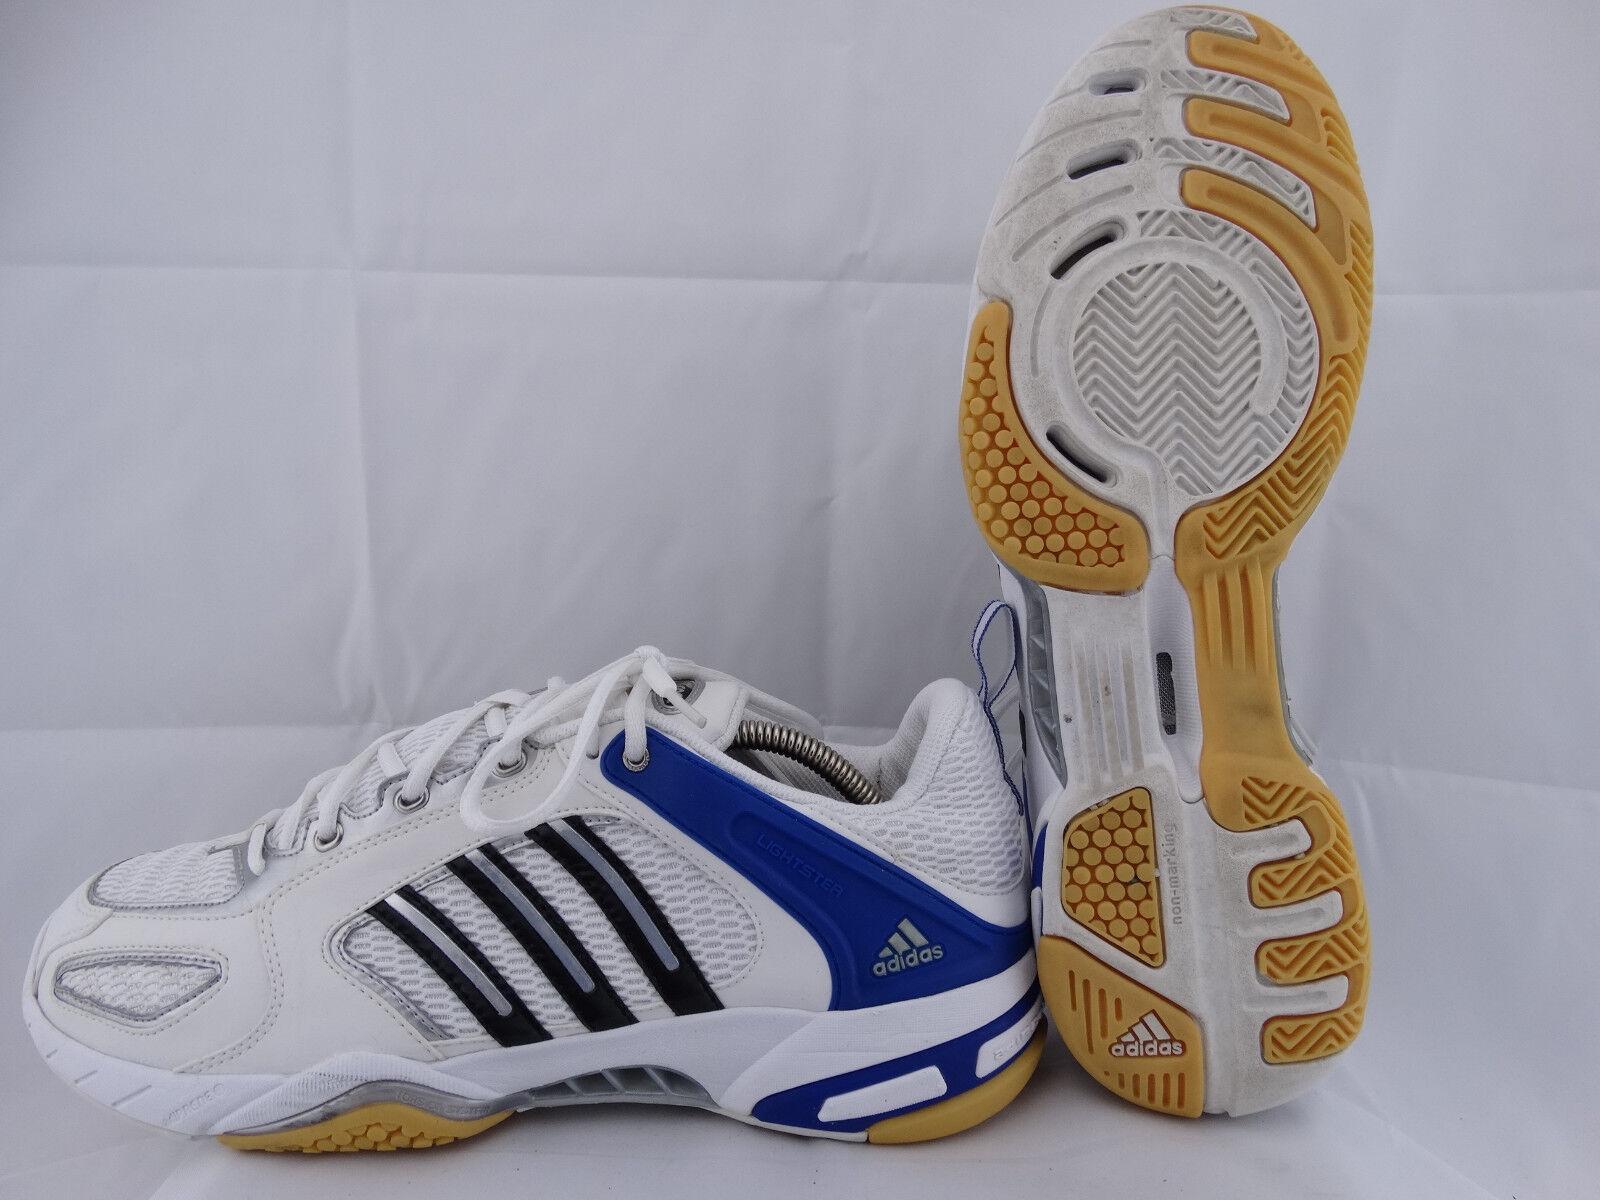 Adidas CC Badmintonschuhe ClimaCool 464206 weiß-blau-silber EU 47 1 3 UK 12